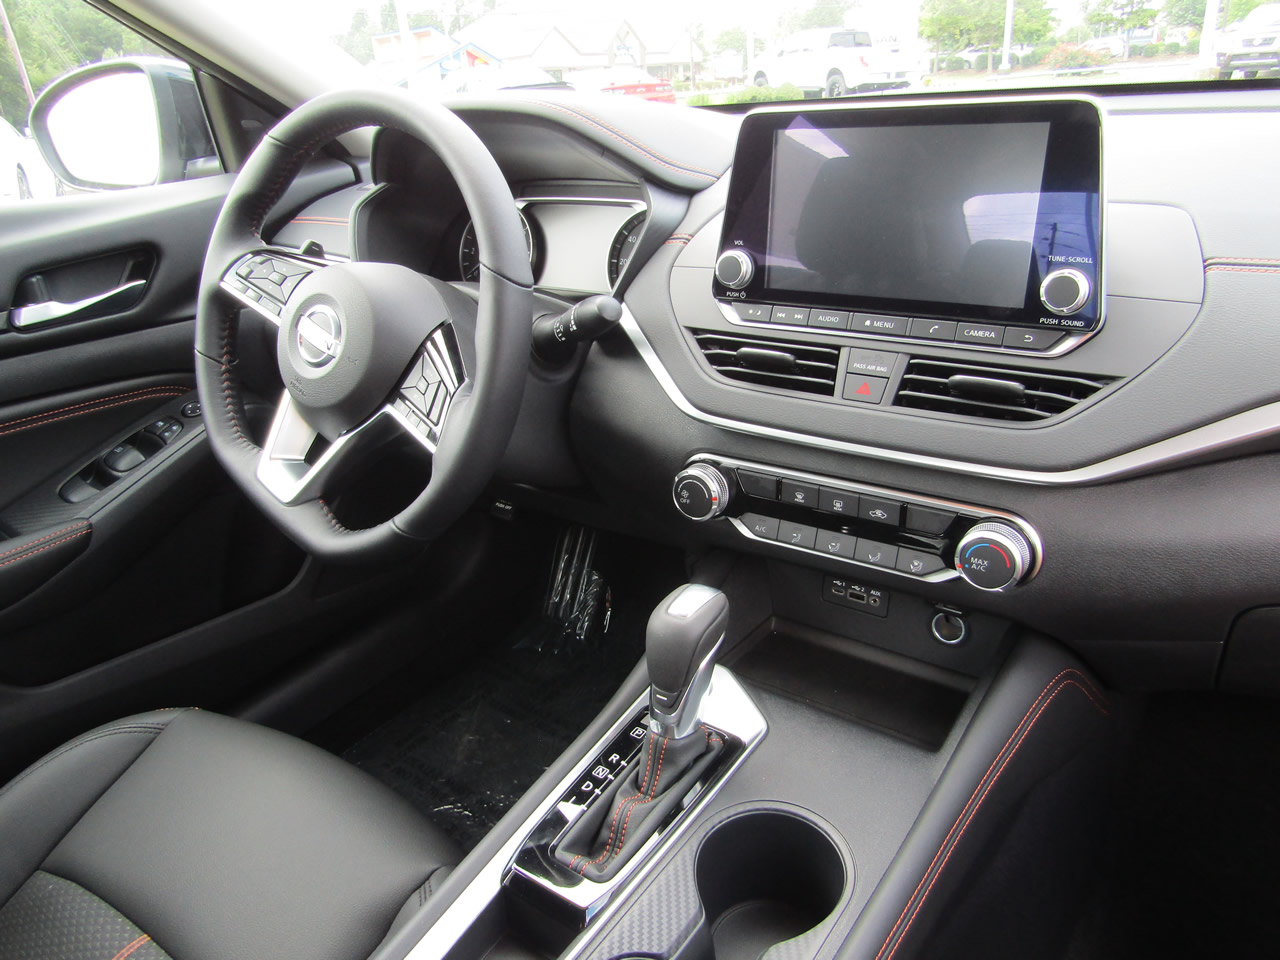 New 2020 Nissan Altima 2 5sr Vin 1n4bl4cv6lc119856 Manual Guide